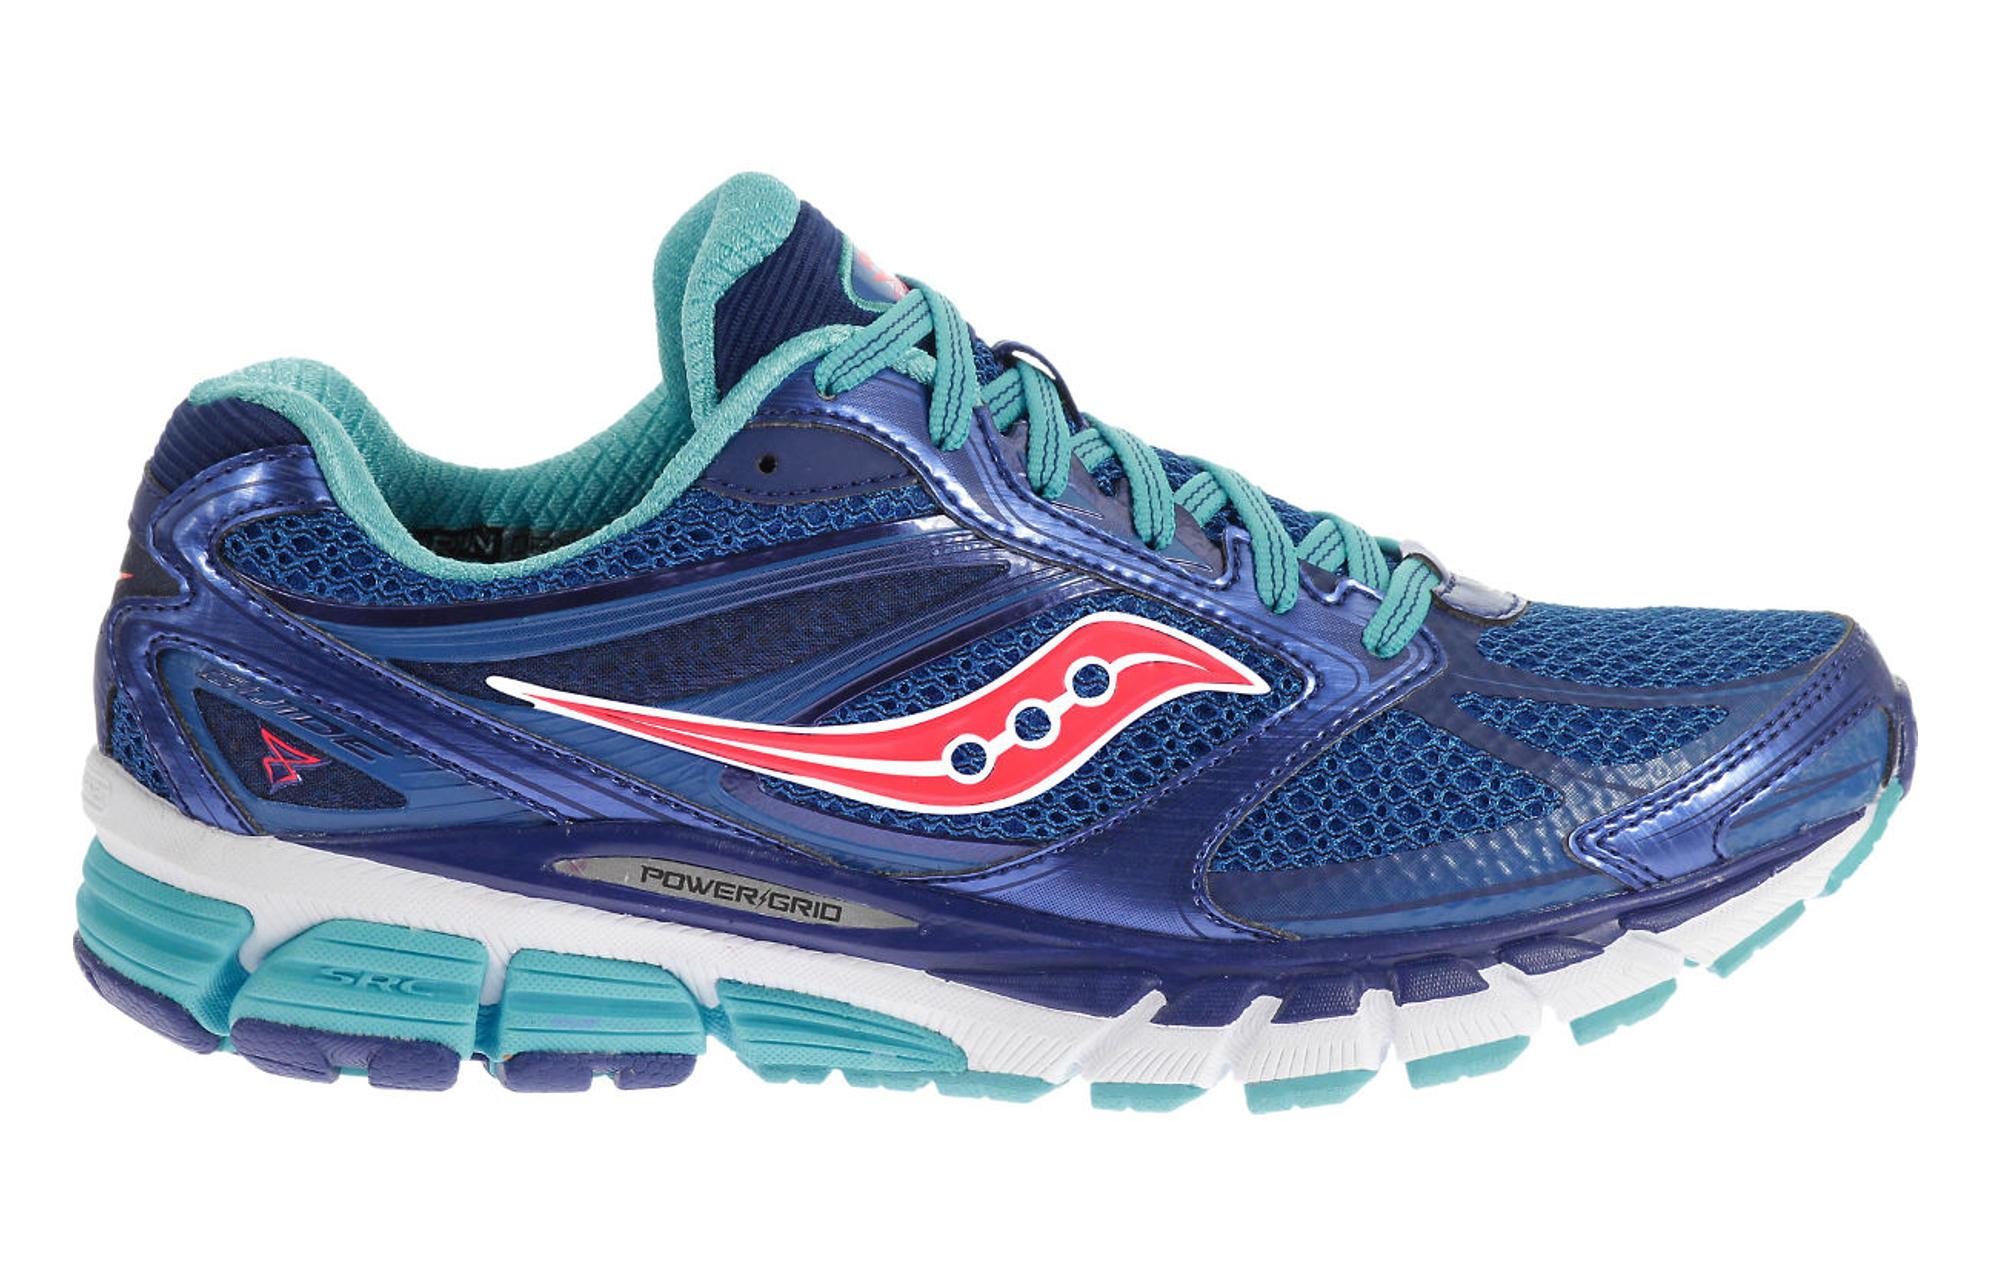 f2da18b206db Saucony Guide 8 Womens Running Shoes